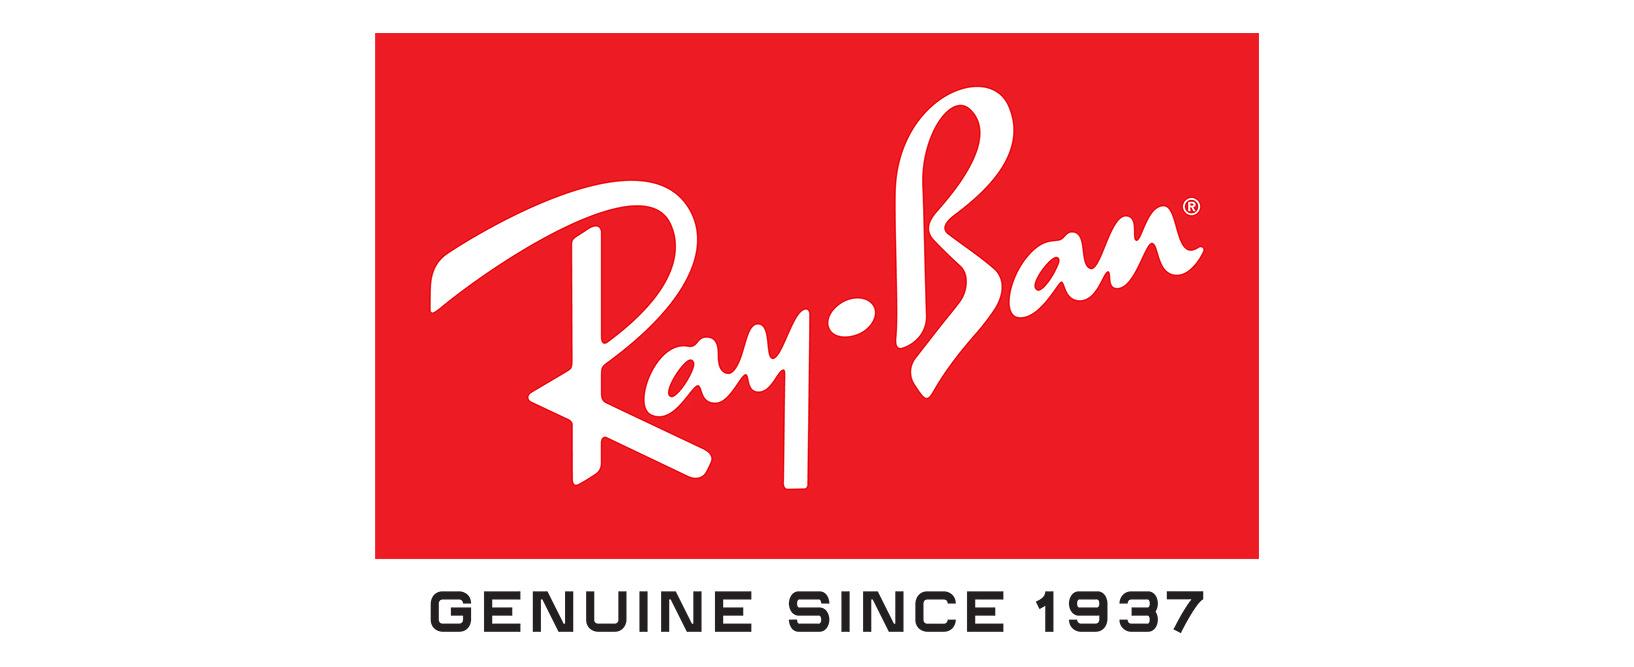 Ray Ban glasses logo